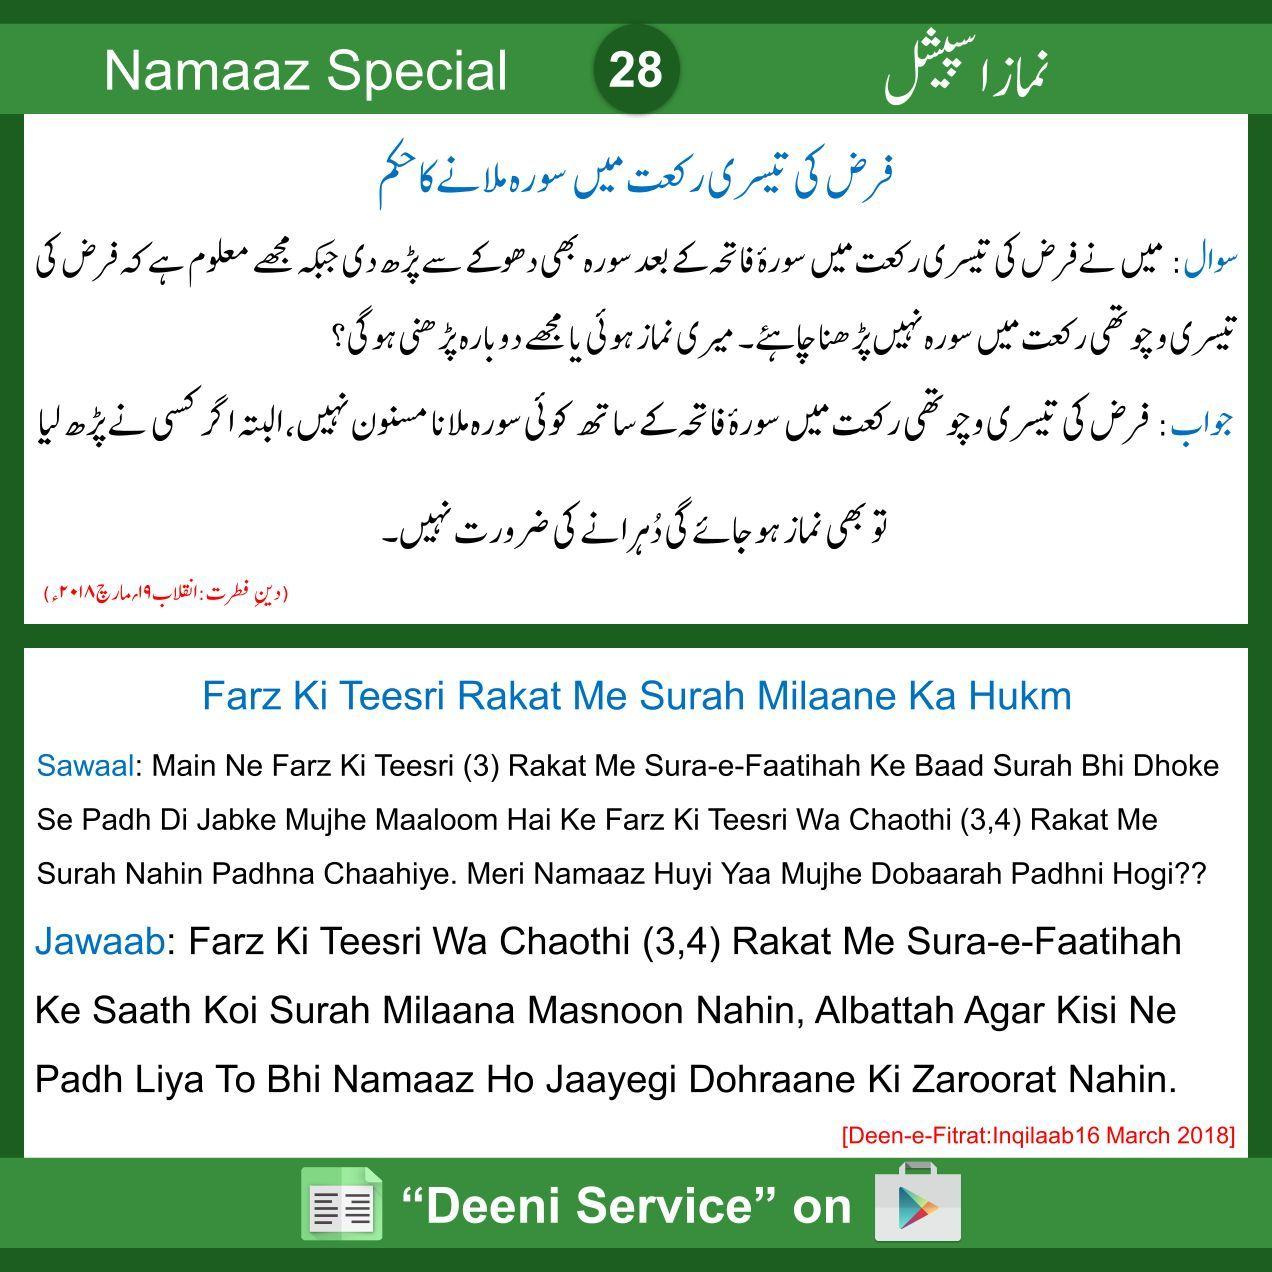 Namaz Farz Ki Teesri Rakat Me Surah Milaane Ka Hukm Namaz Imam Ali Quotes Ali Quotes